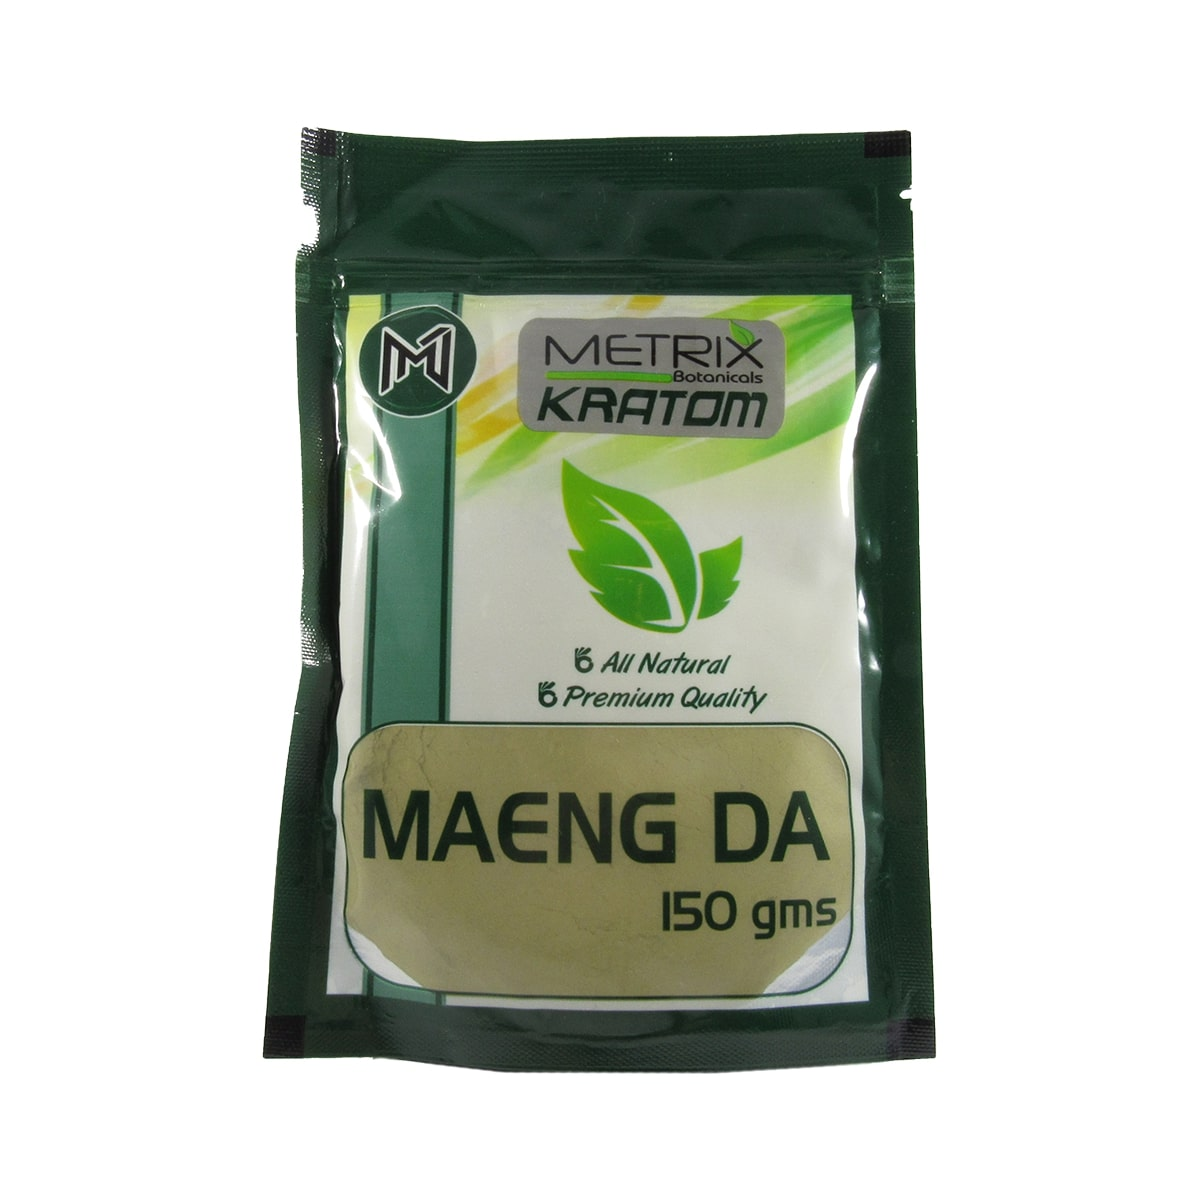 Metrix Maeng Da Kratom Powder 150g - Front